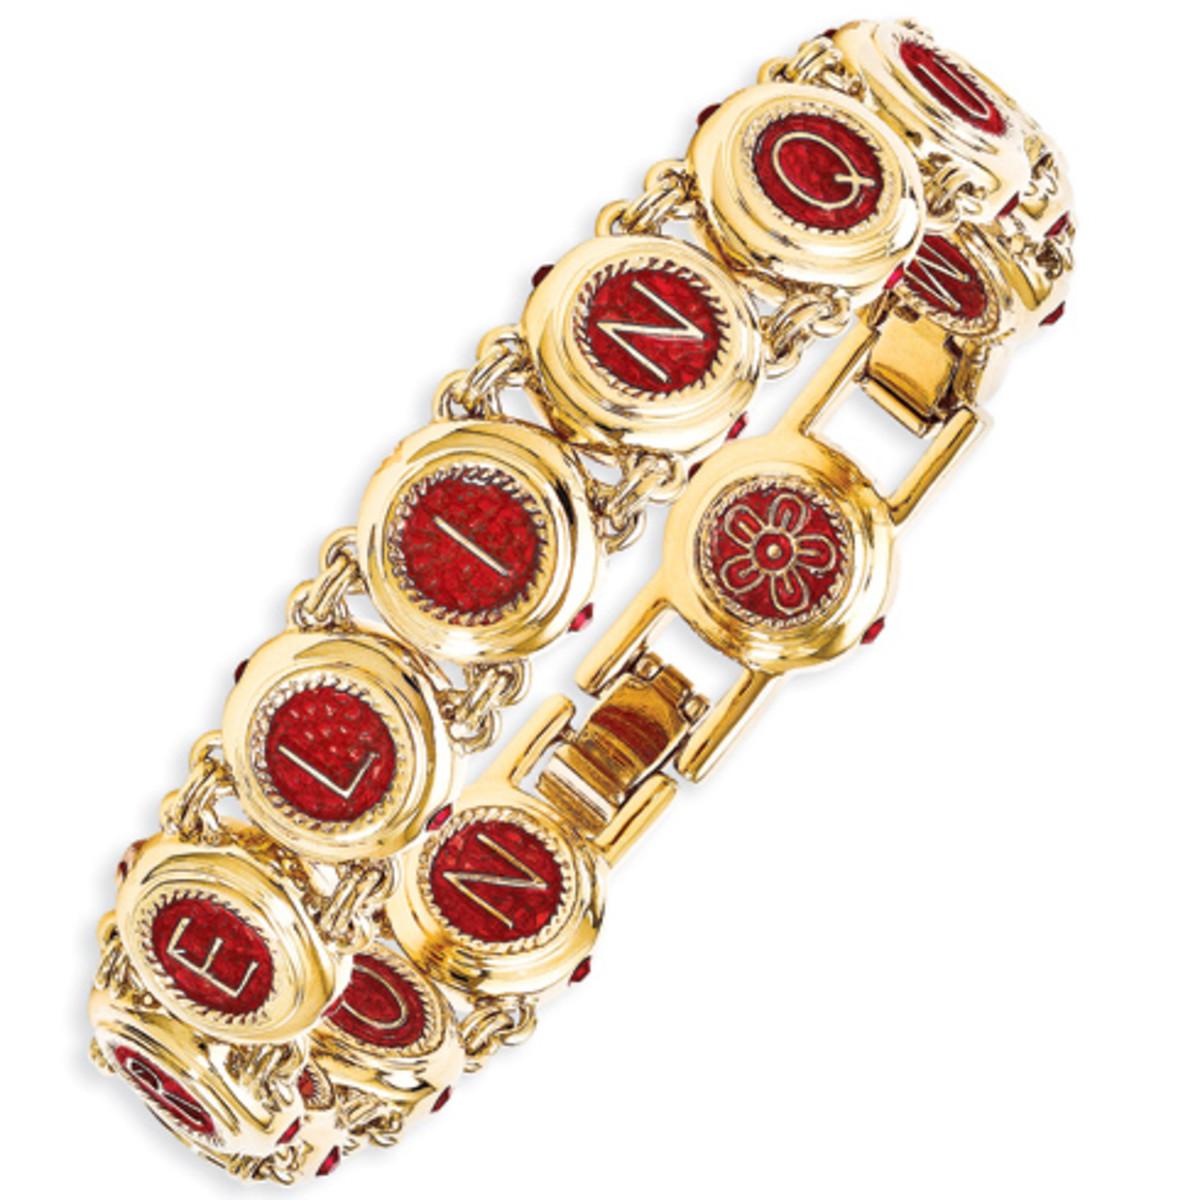 Jacqueline Kennedy Castellani Wedding/Love Bracelet